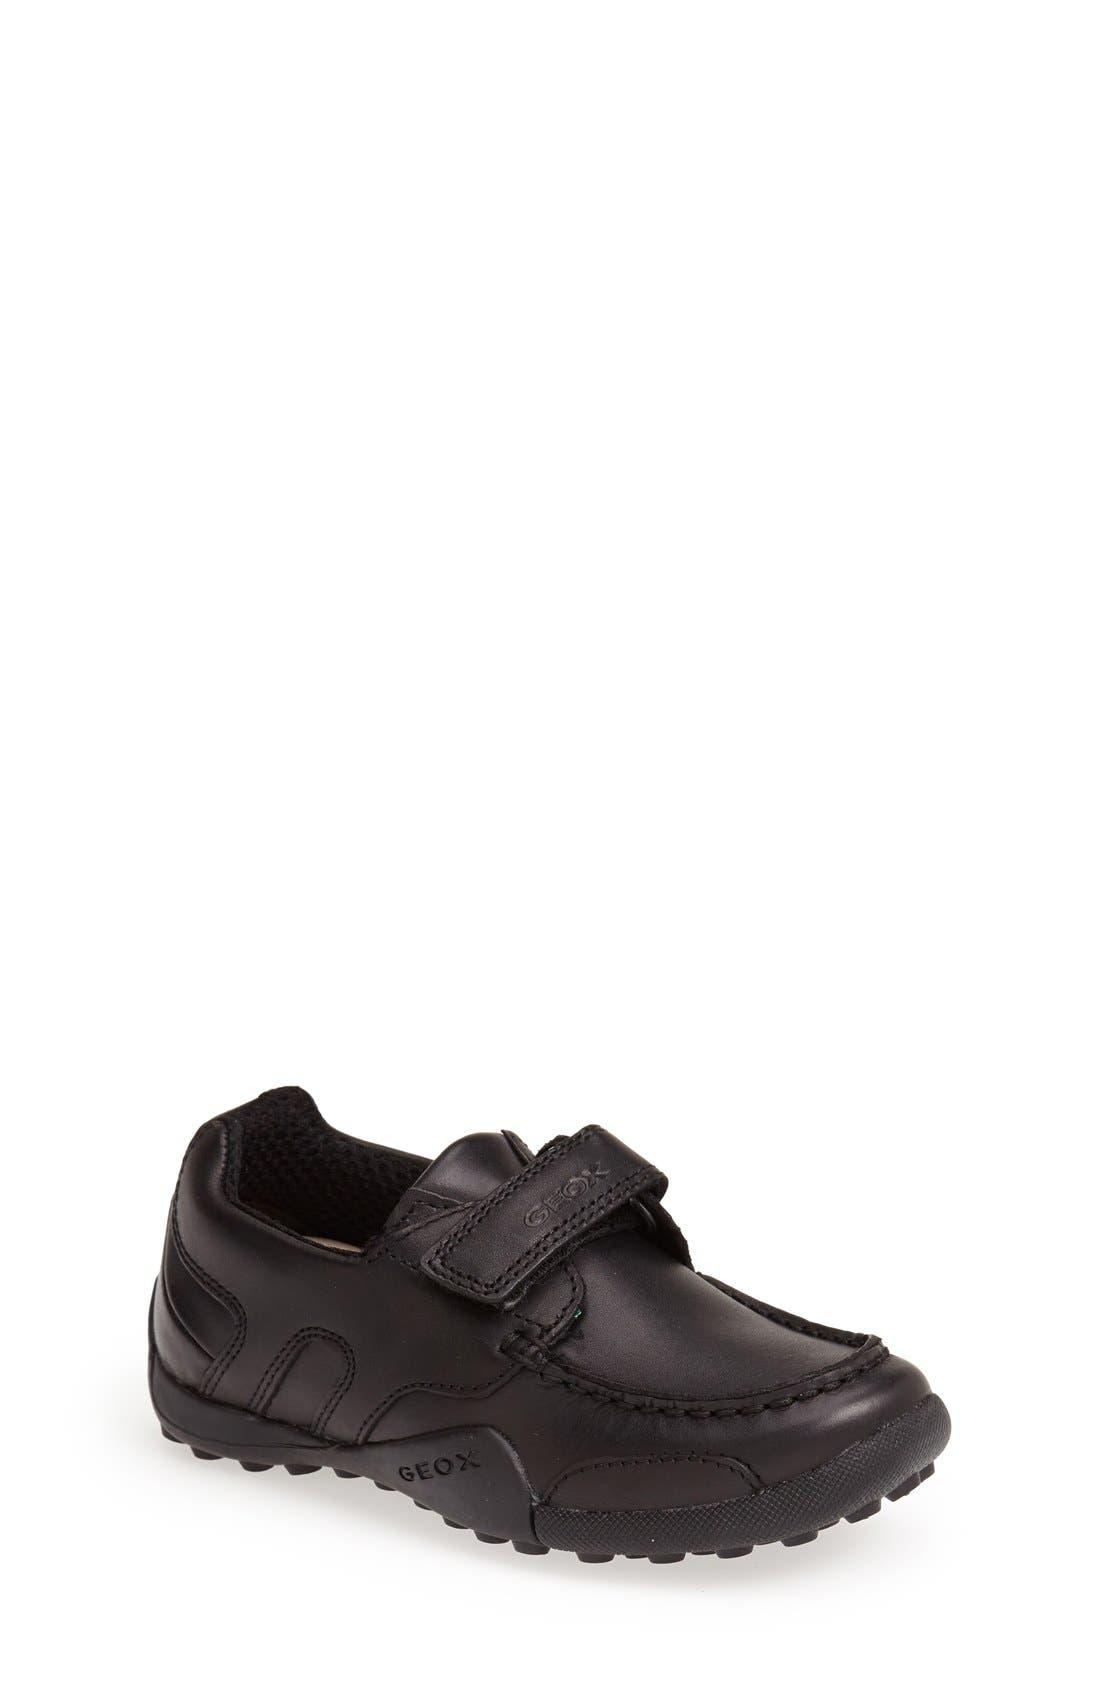 'Snake Moc 2' Leather Loafer,                             Main thumbnail 1, color,                             BLACK